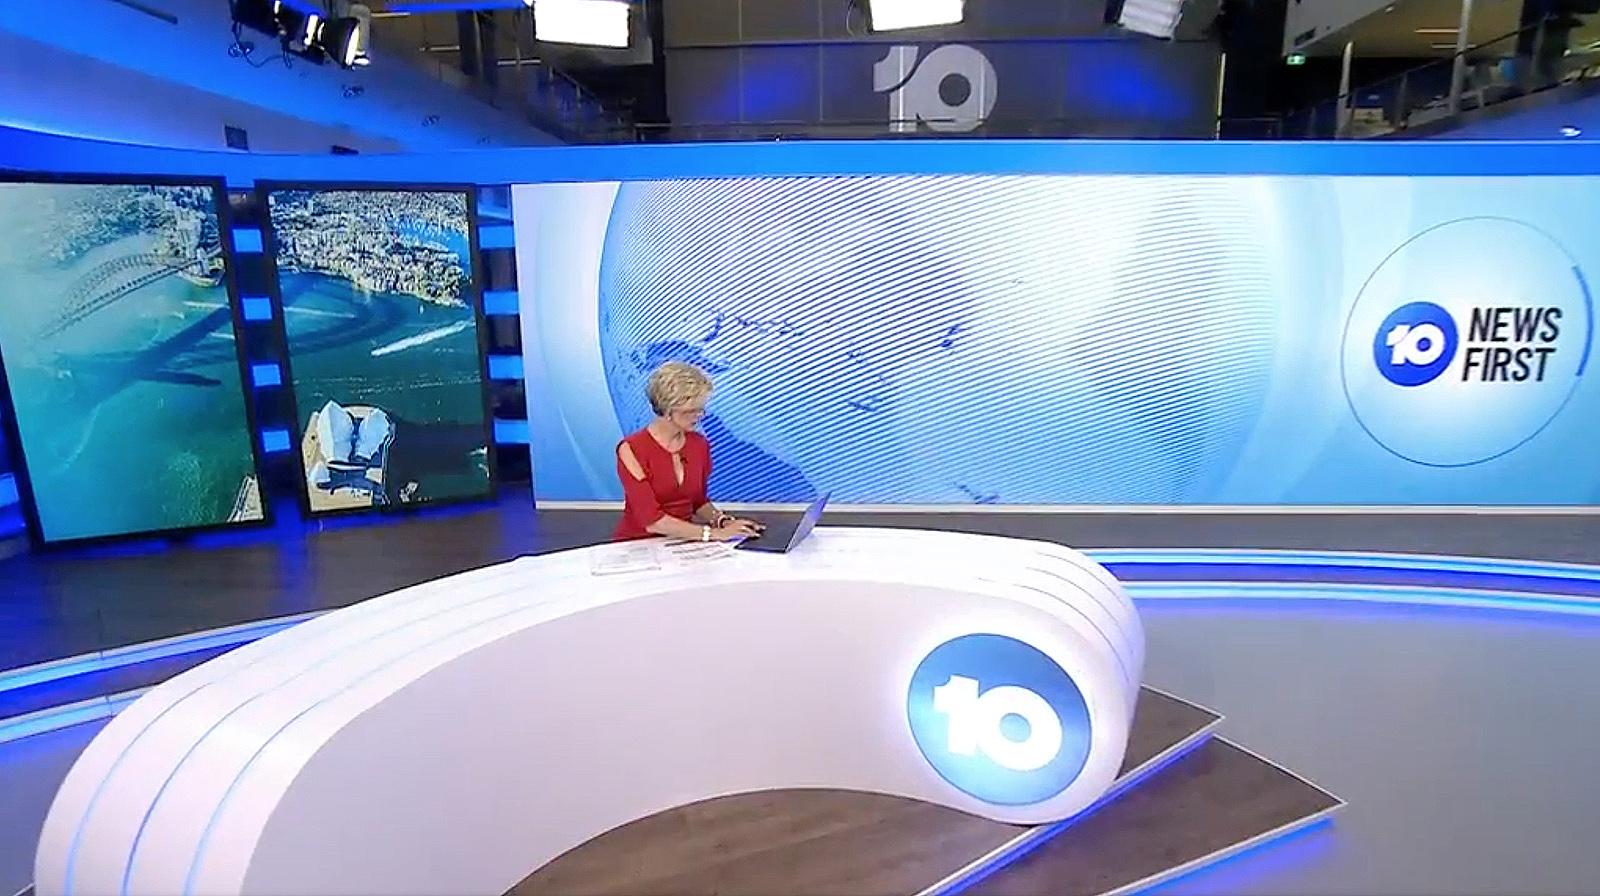 NCS_Network-10-Sydney-10-News-First-studio_021